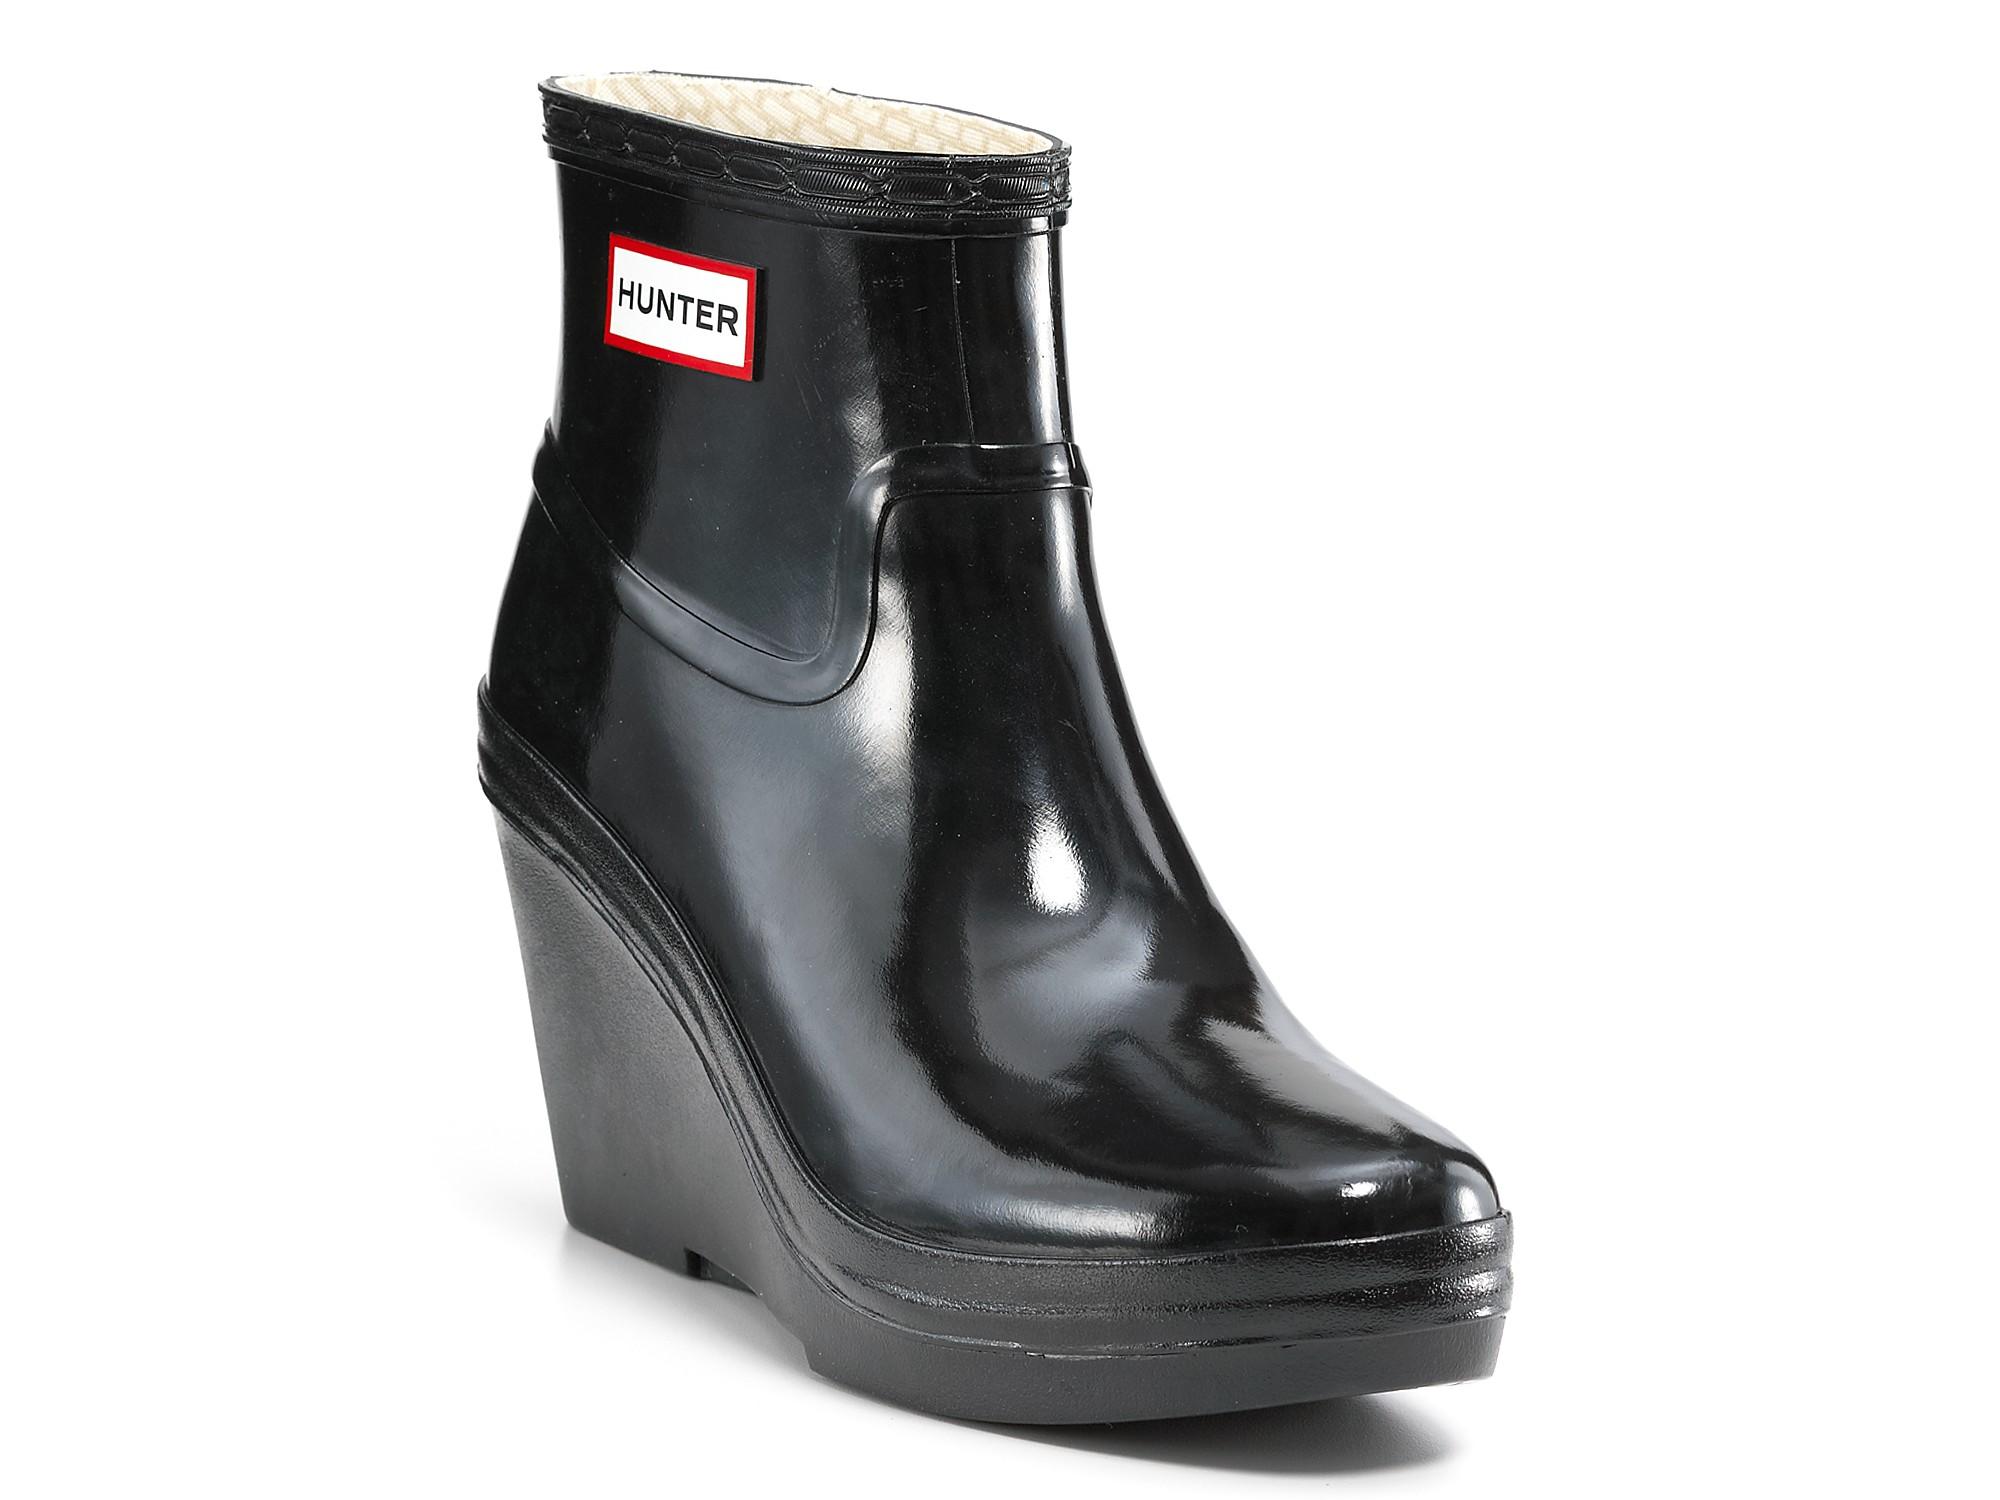 Hunter Rain Boots Aston Gloss Wedge In Graphite Black - Lyst